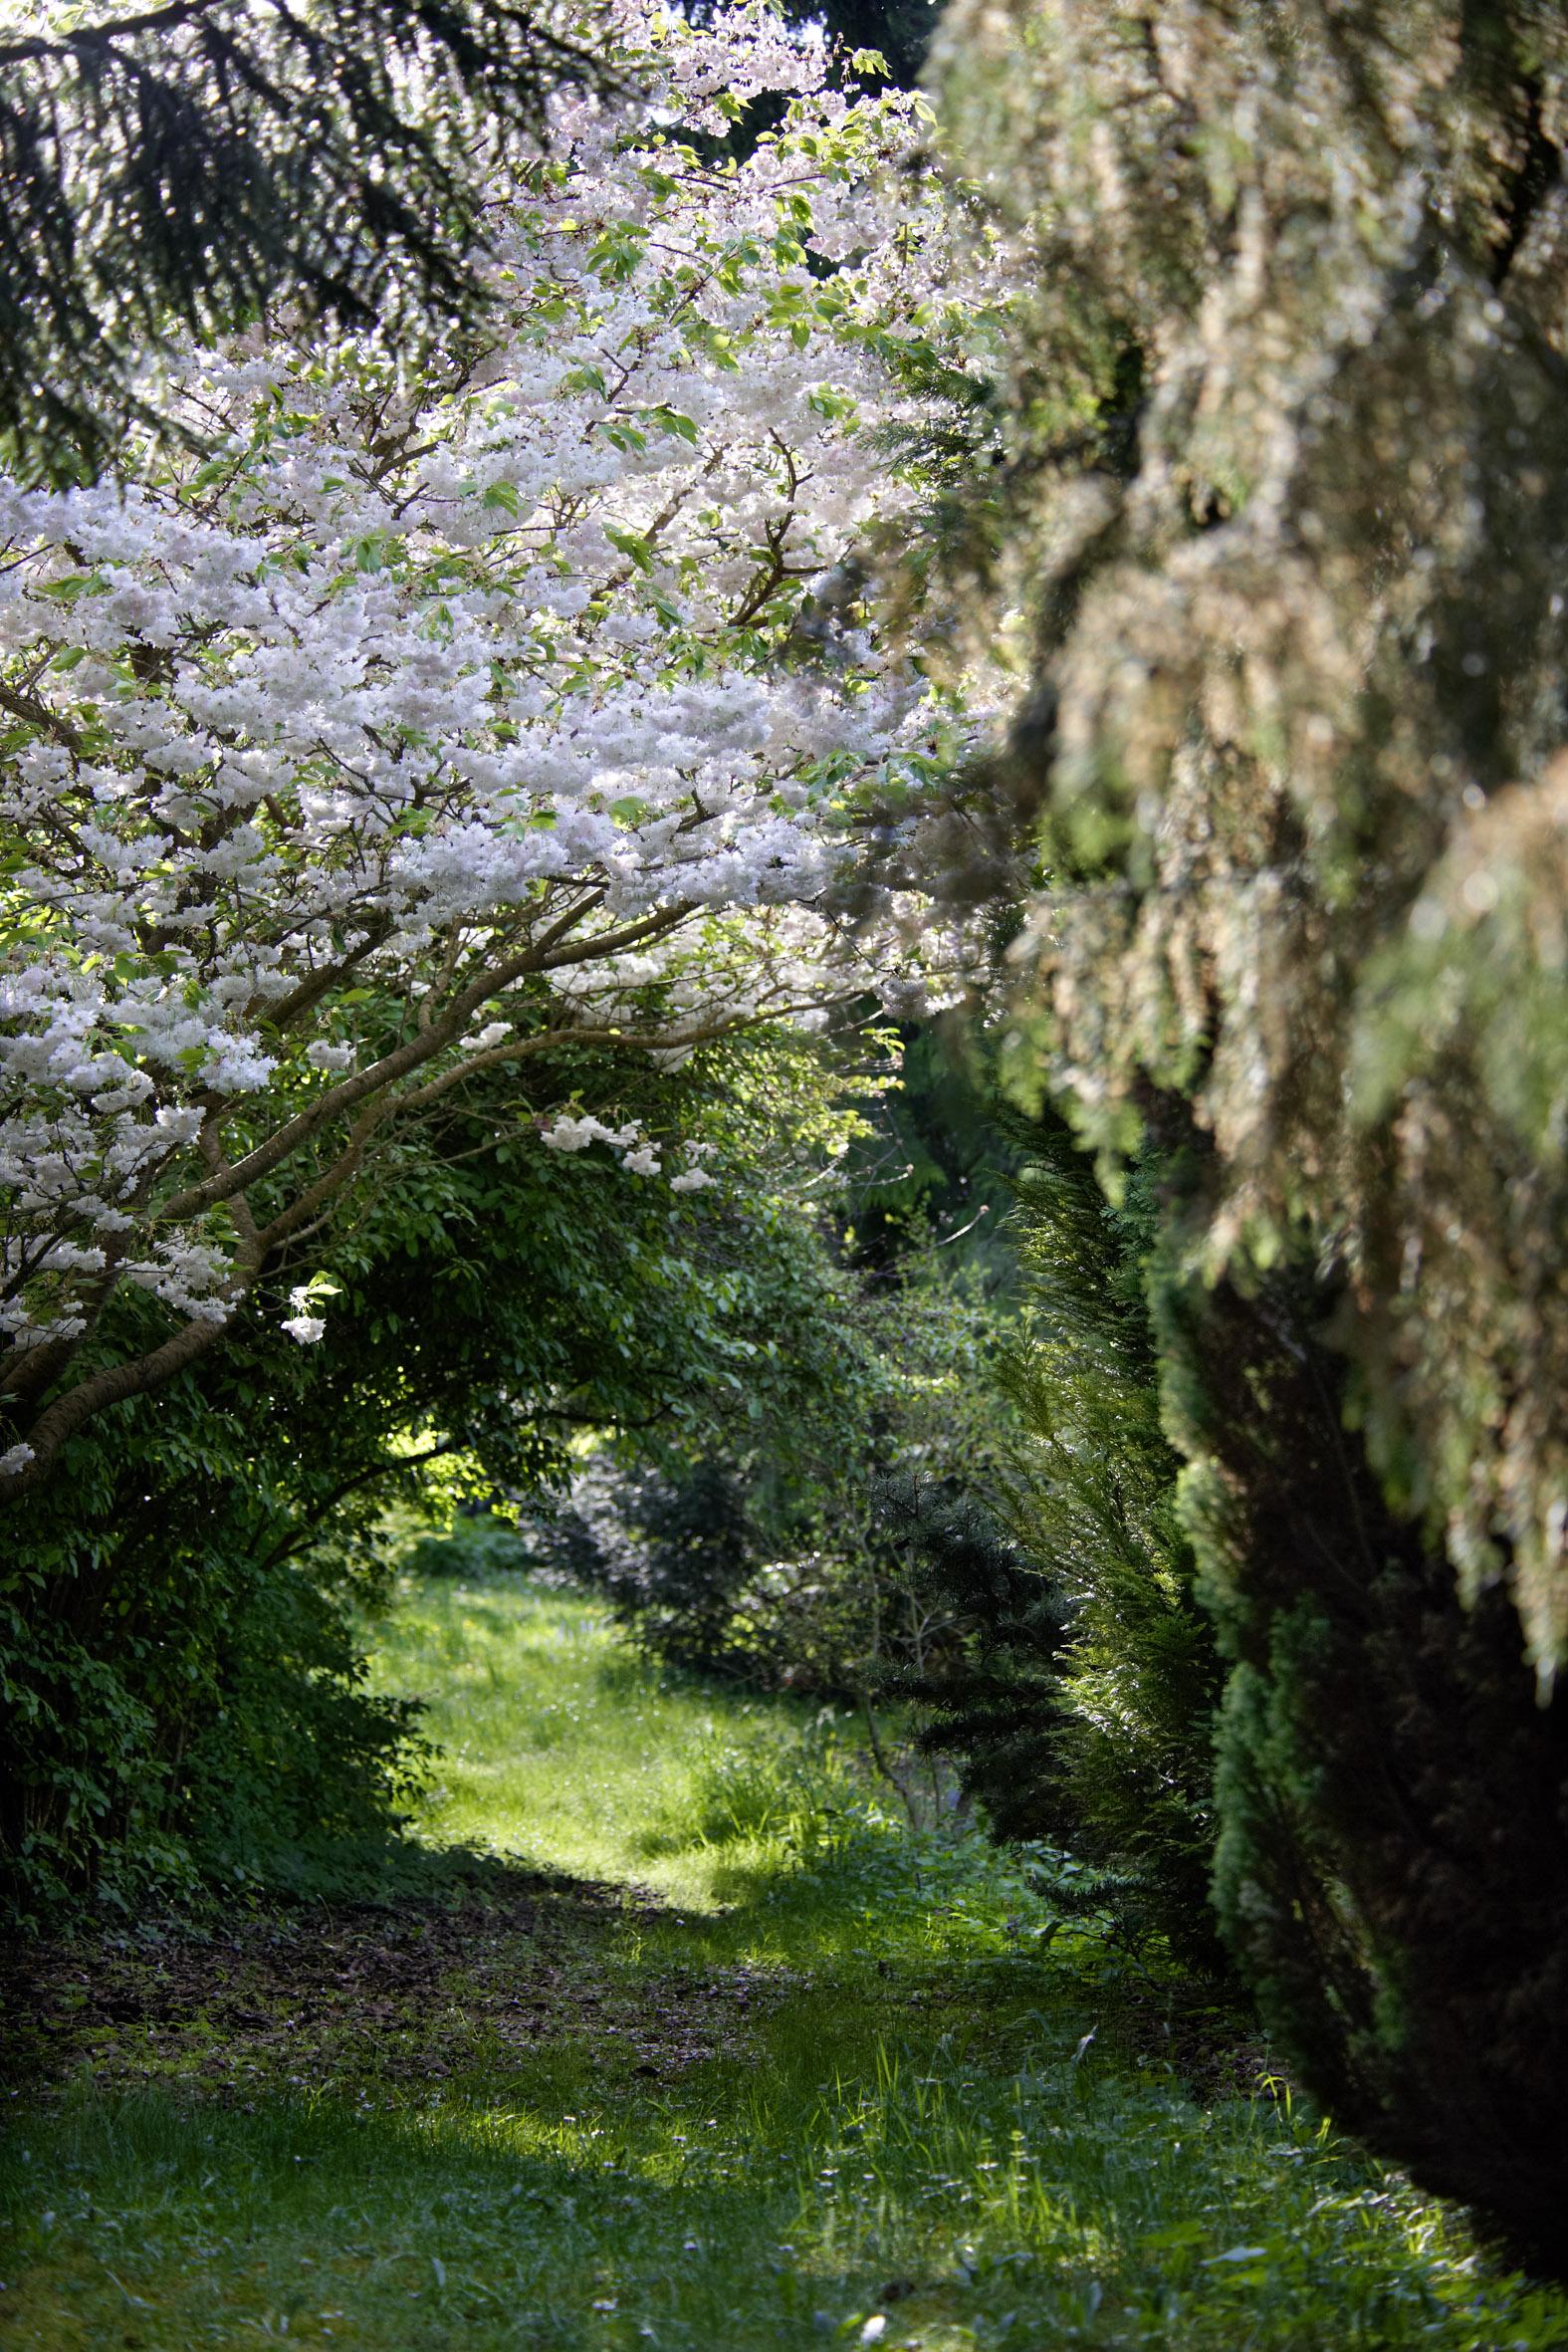 Gartenwelt gundacker for Natur im garten